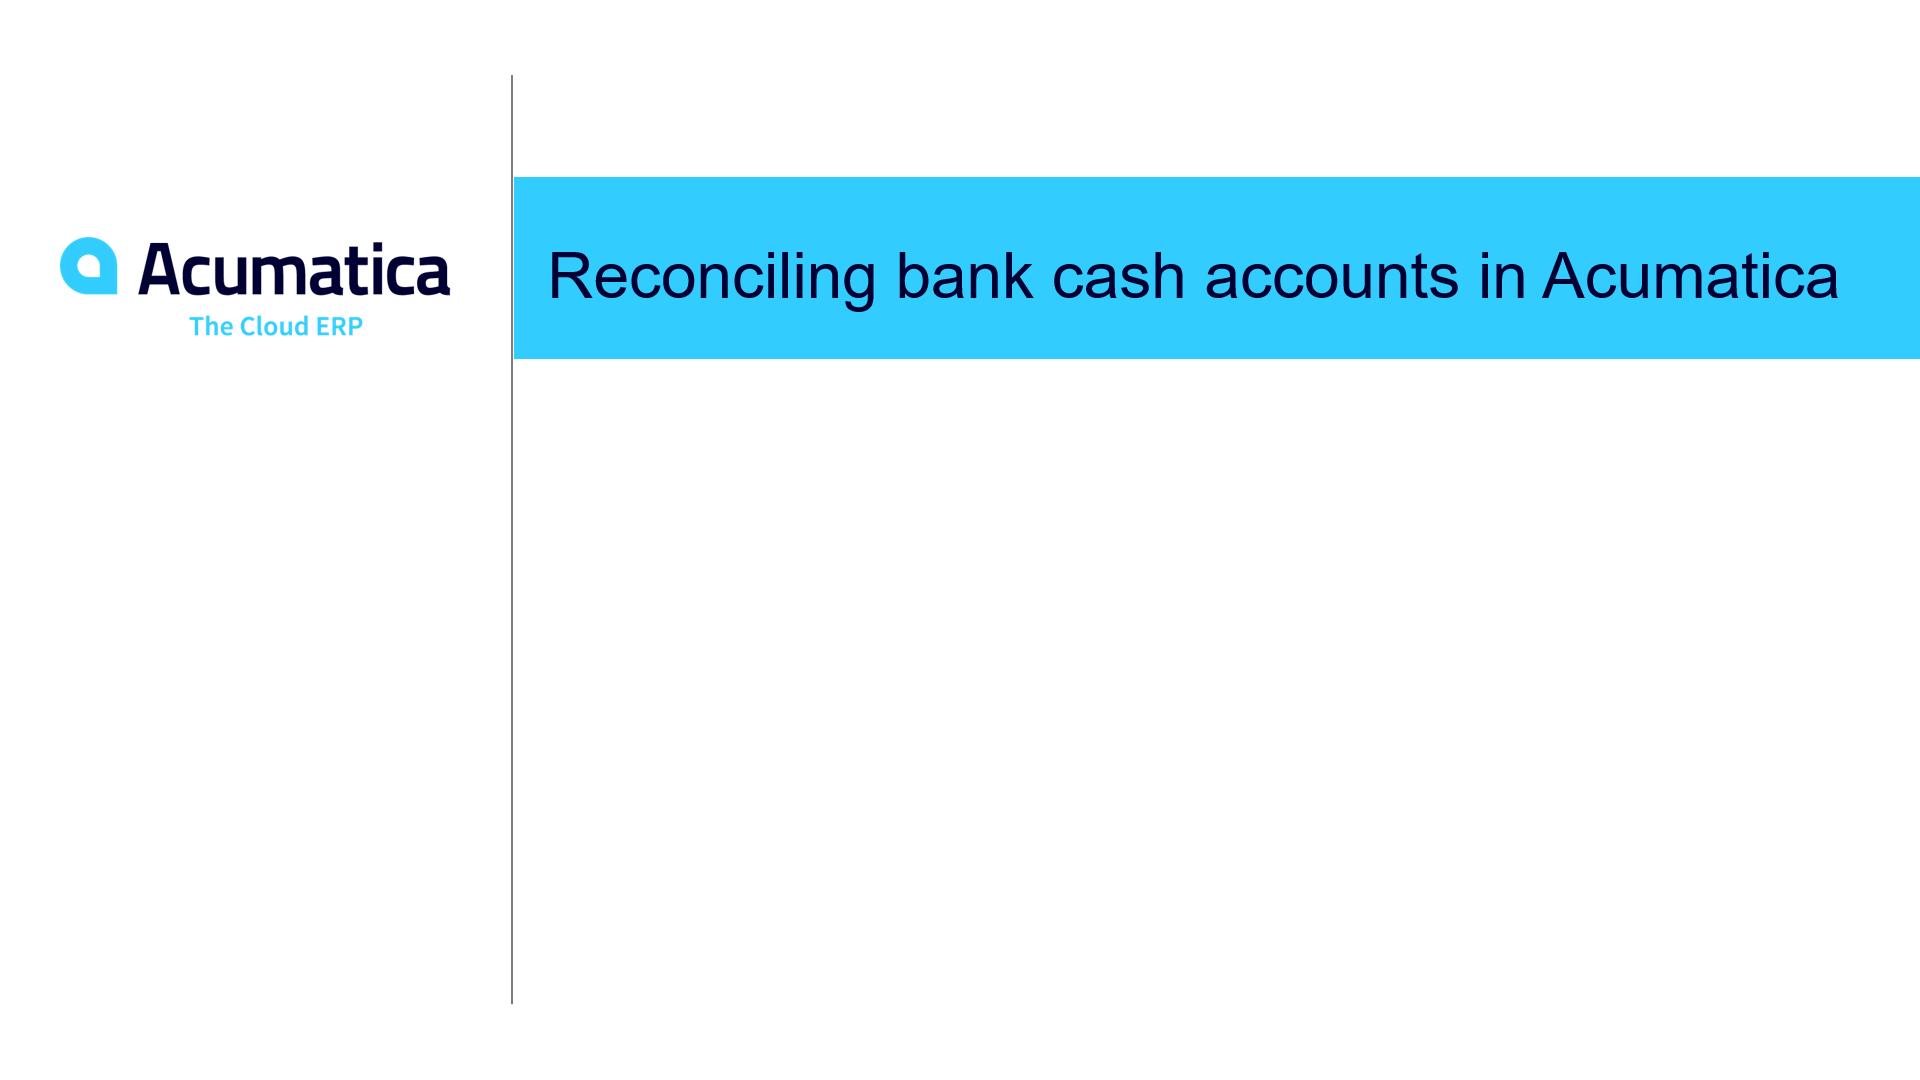 Reconciling bank cash accounts in Acumatica